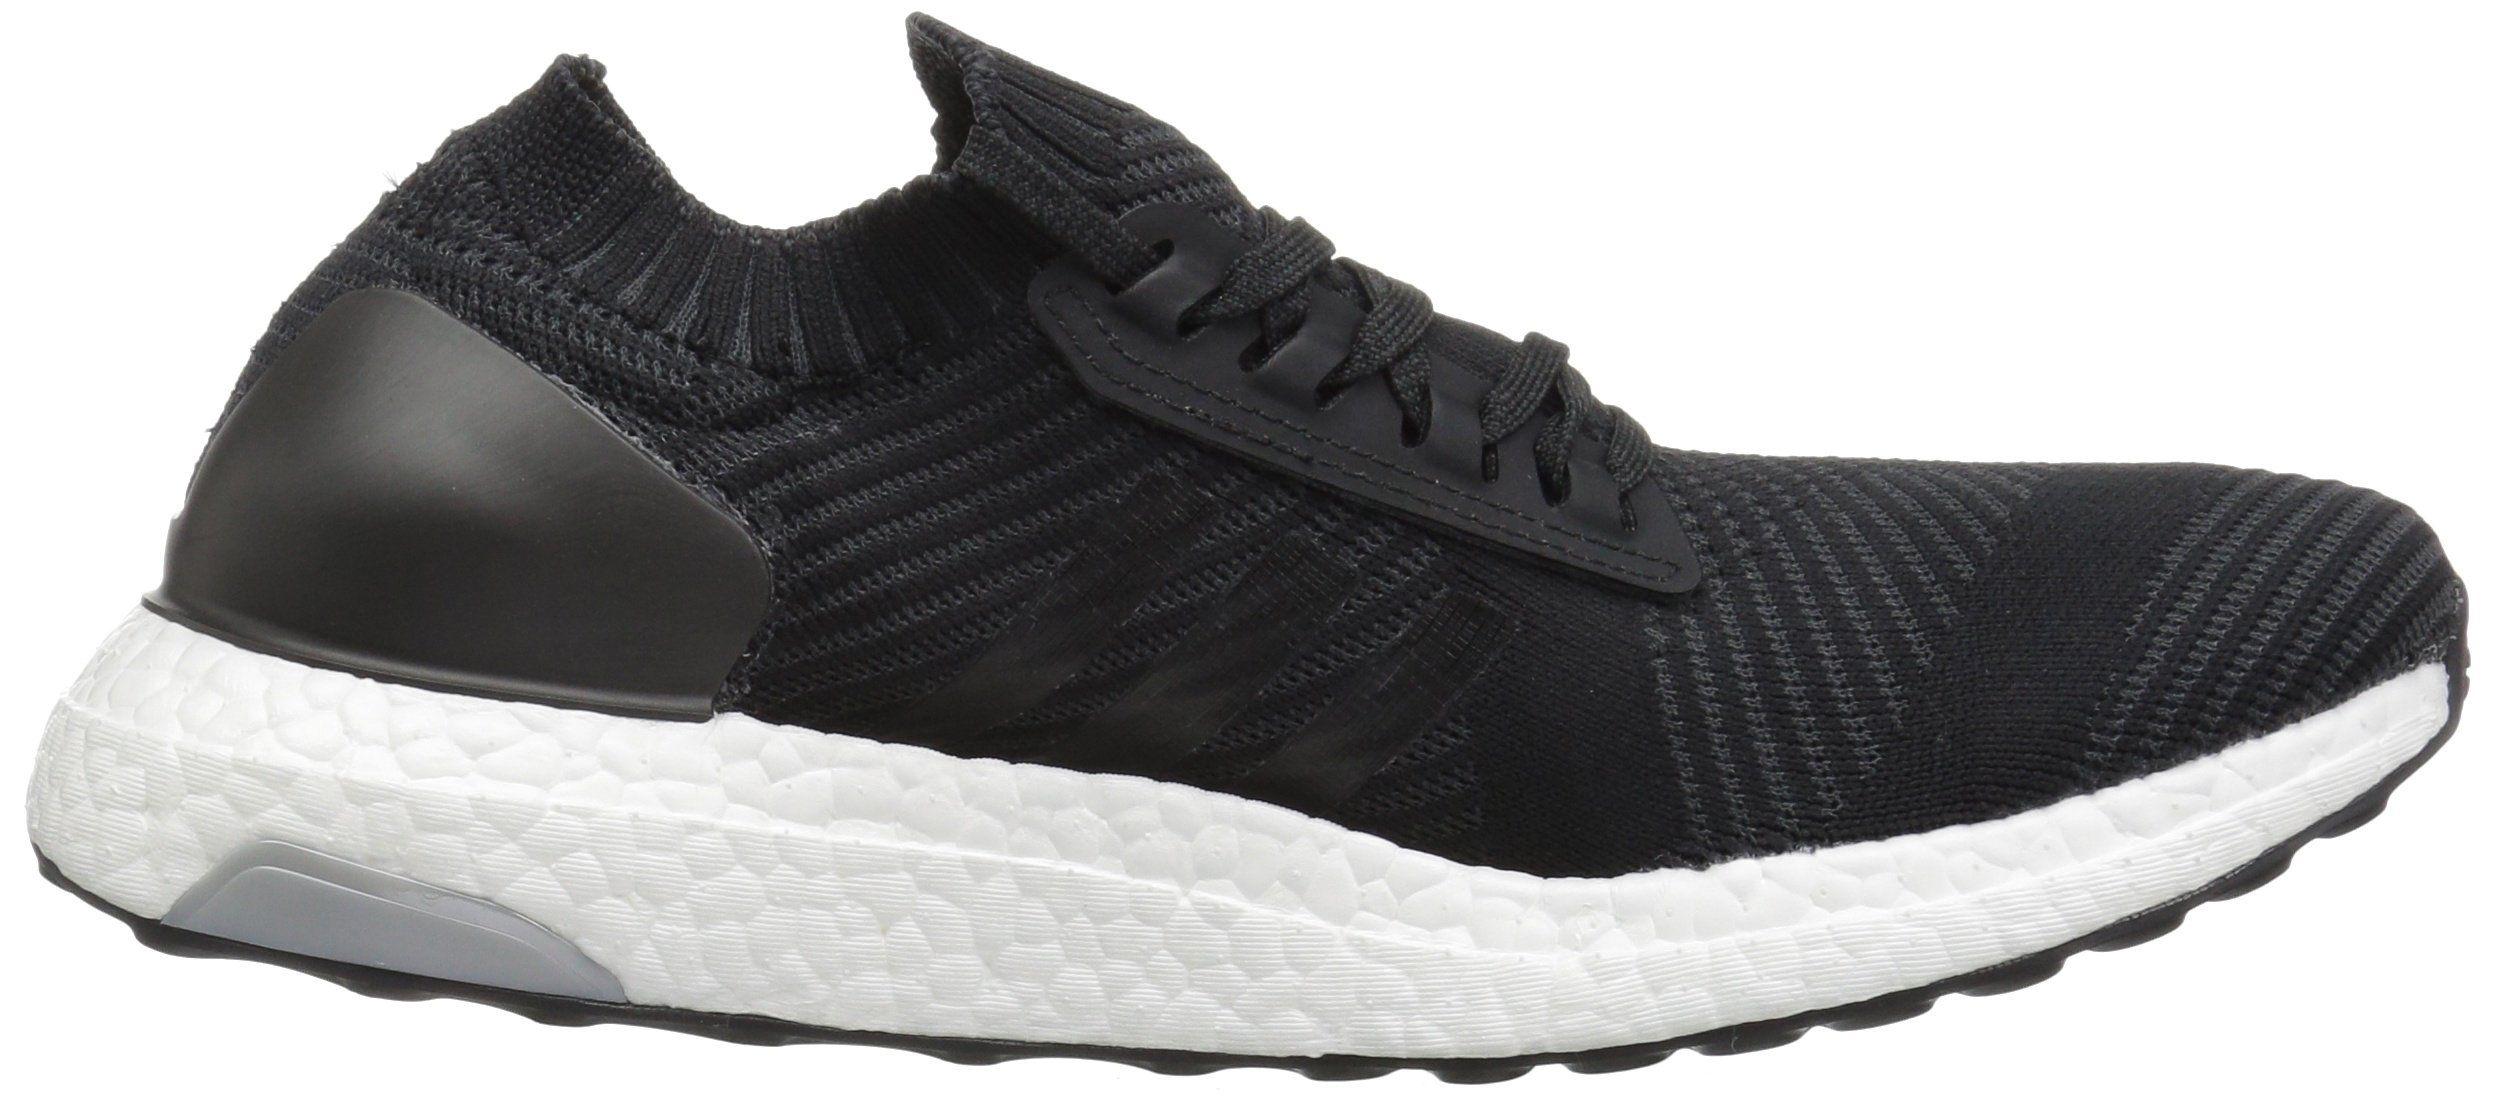 c7b89efa4 adidas Performance Womens Ultraboost X Running Shoe Carbon Crystal White Core  Black 10 M